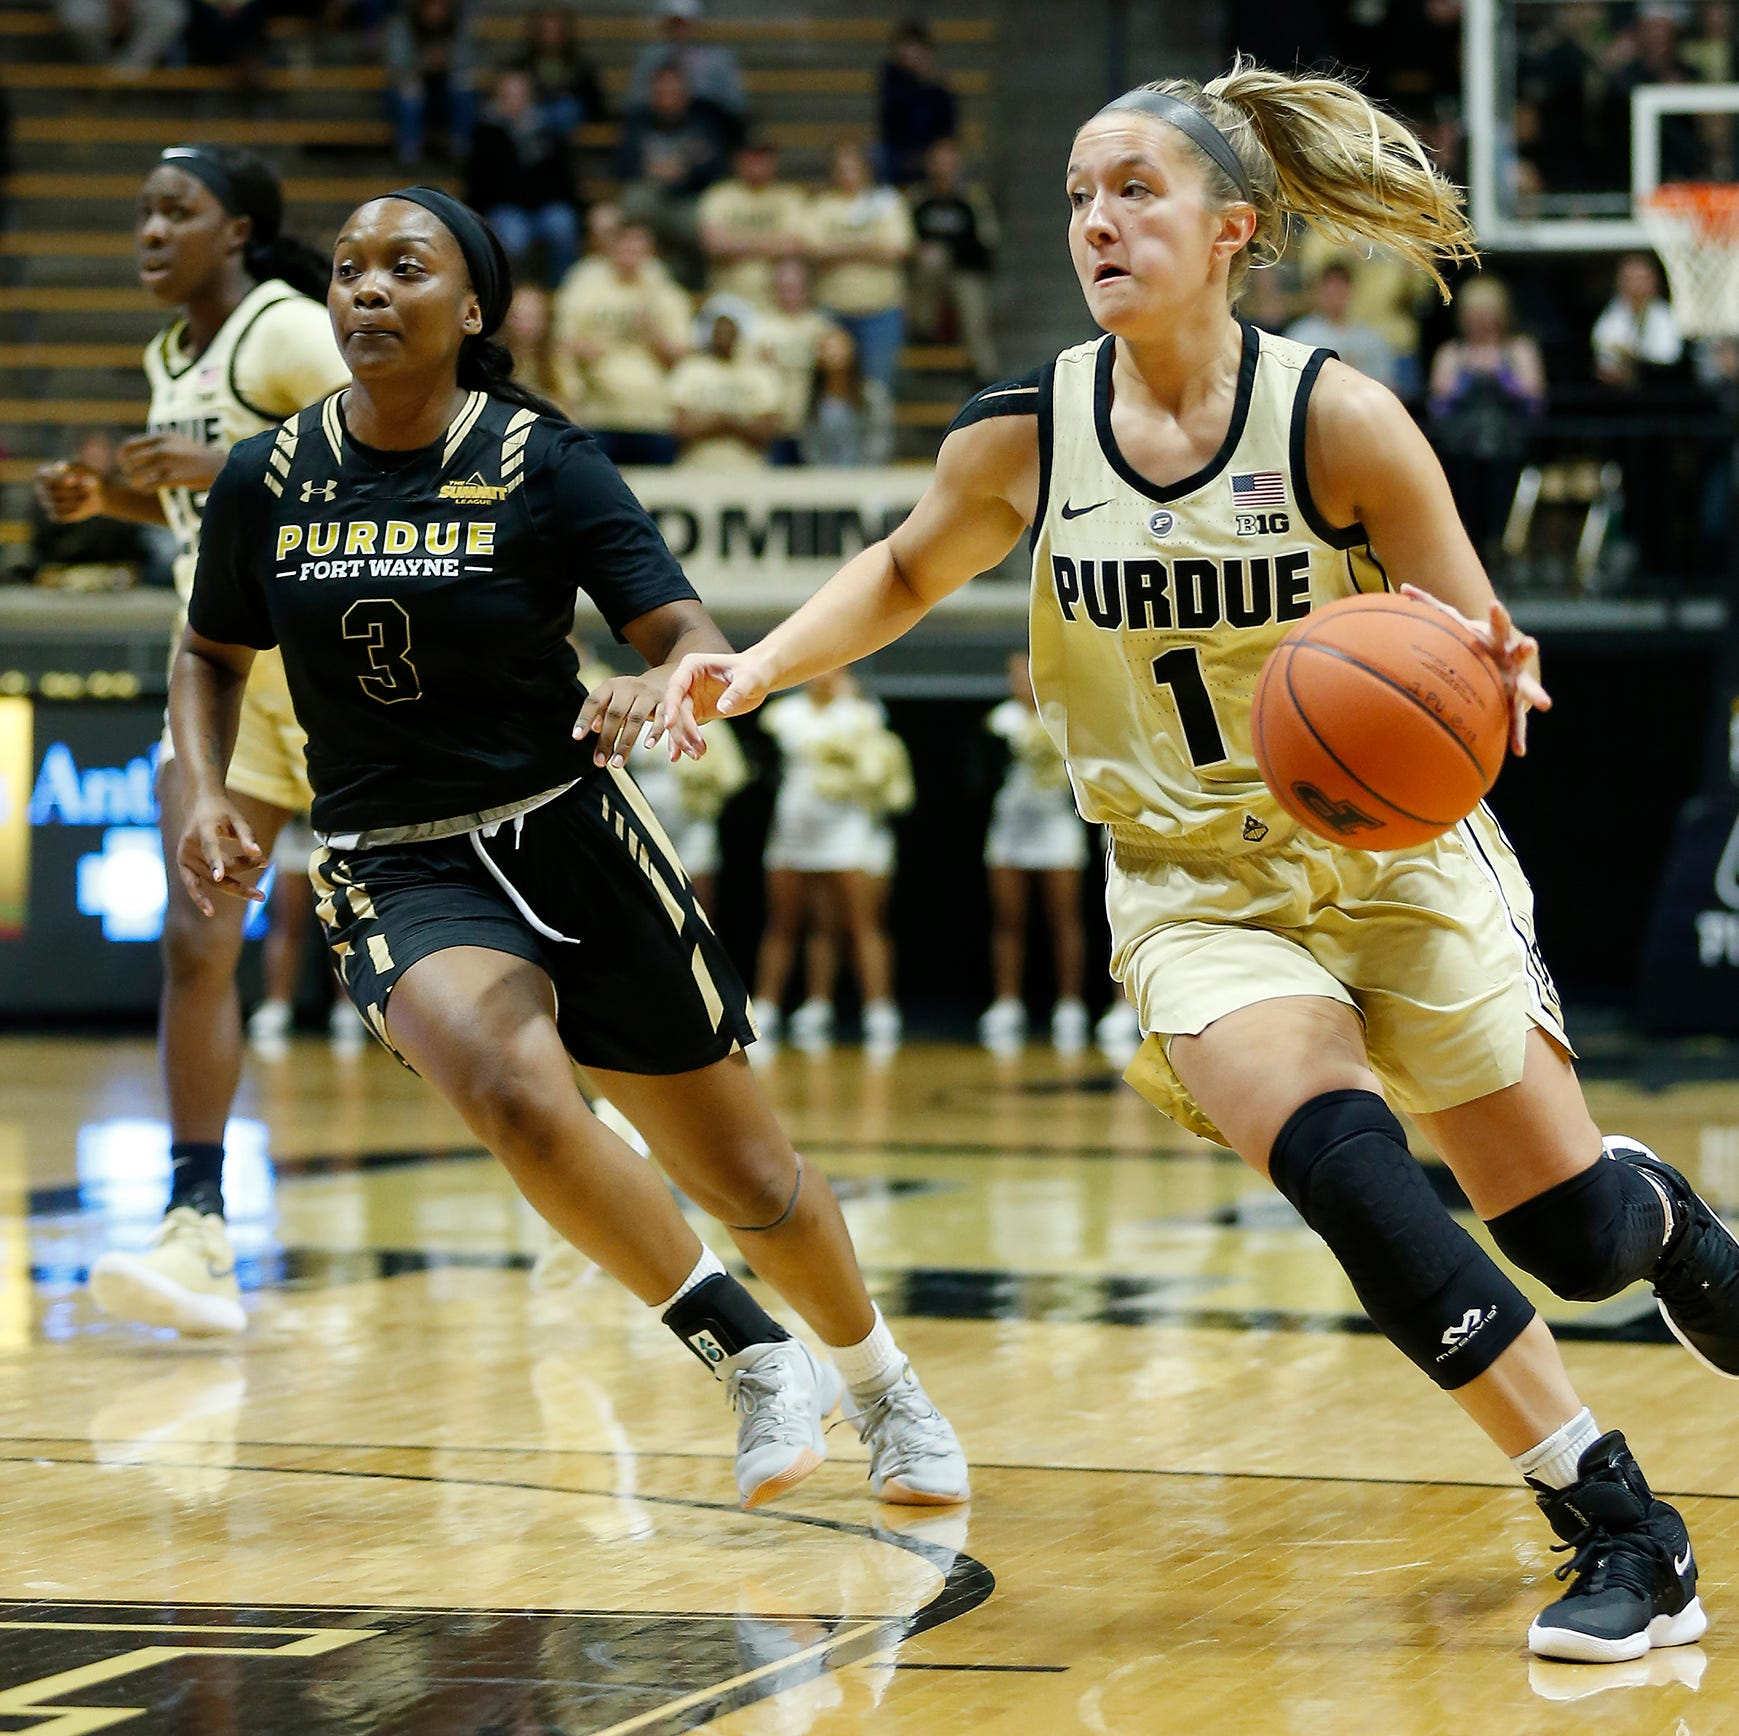 Karissa McLaughlin's career game gives Purdue women's basketball new life